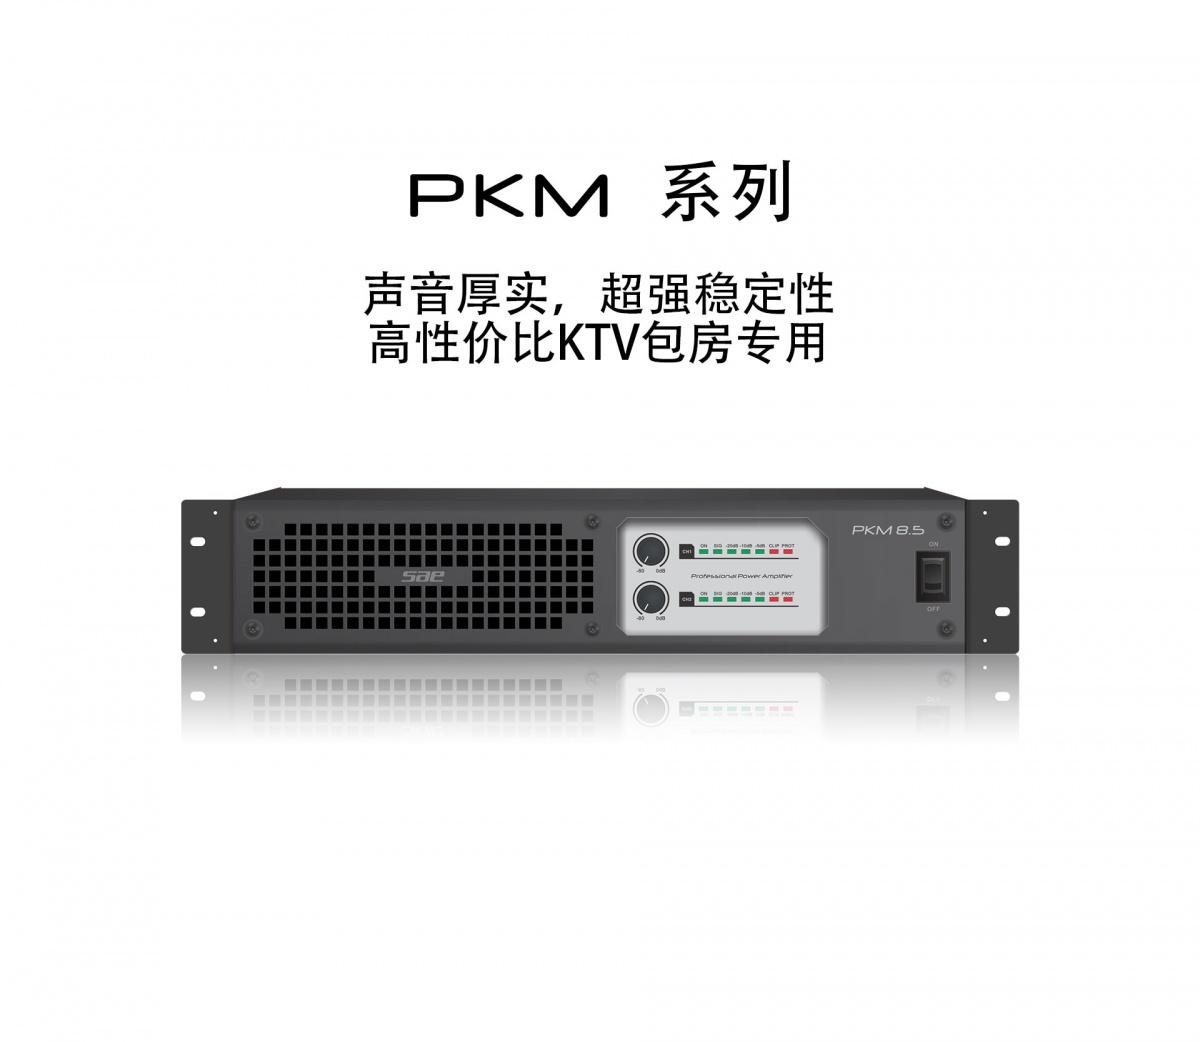 PKM-series-CN.jpg